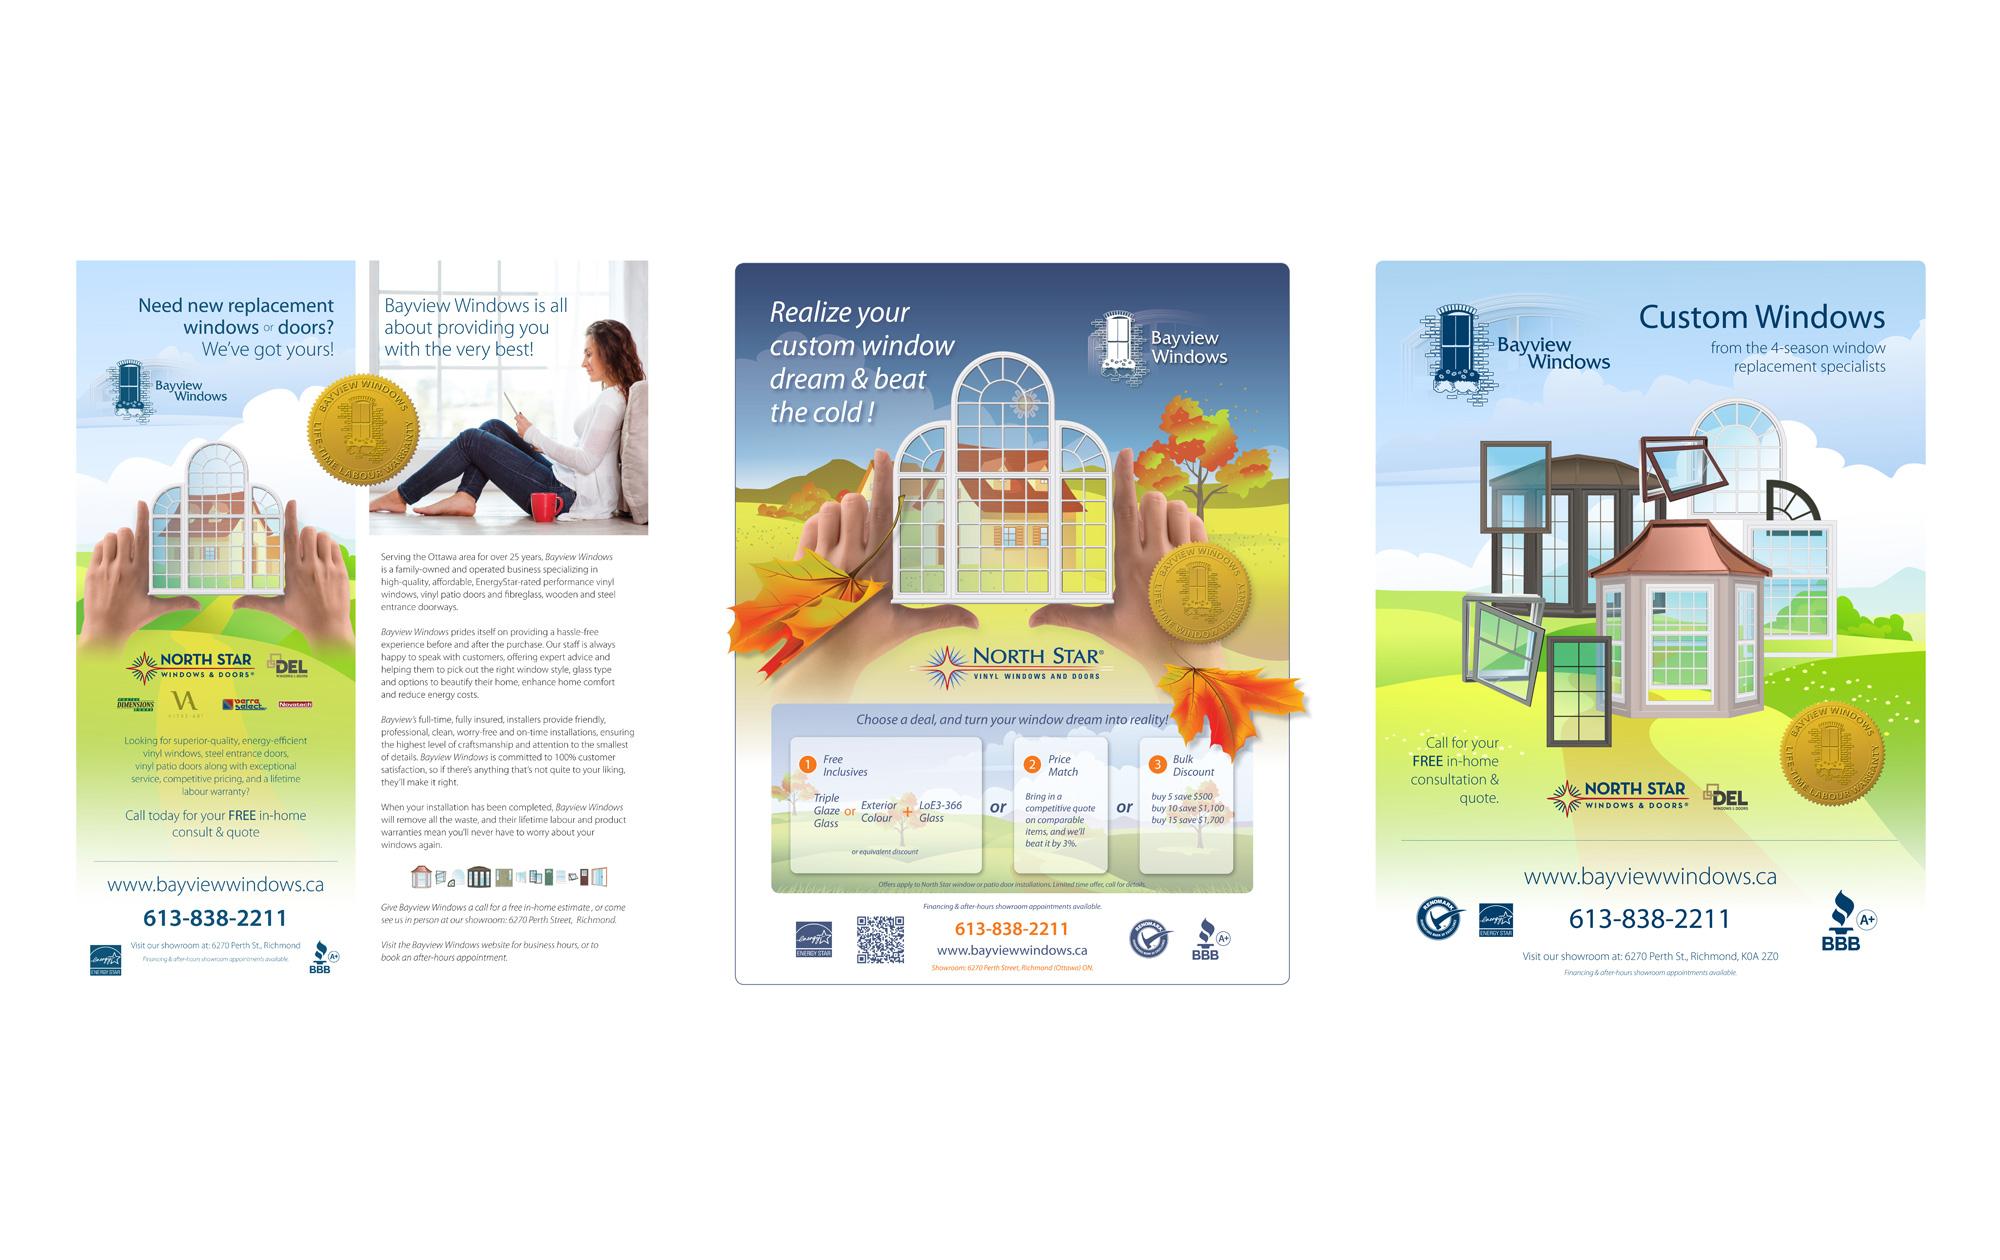 Ottawa Advertising - Bayview Windows - Grouping of ads